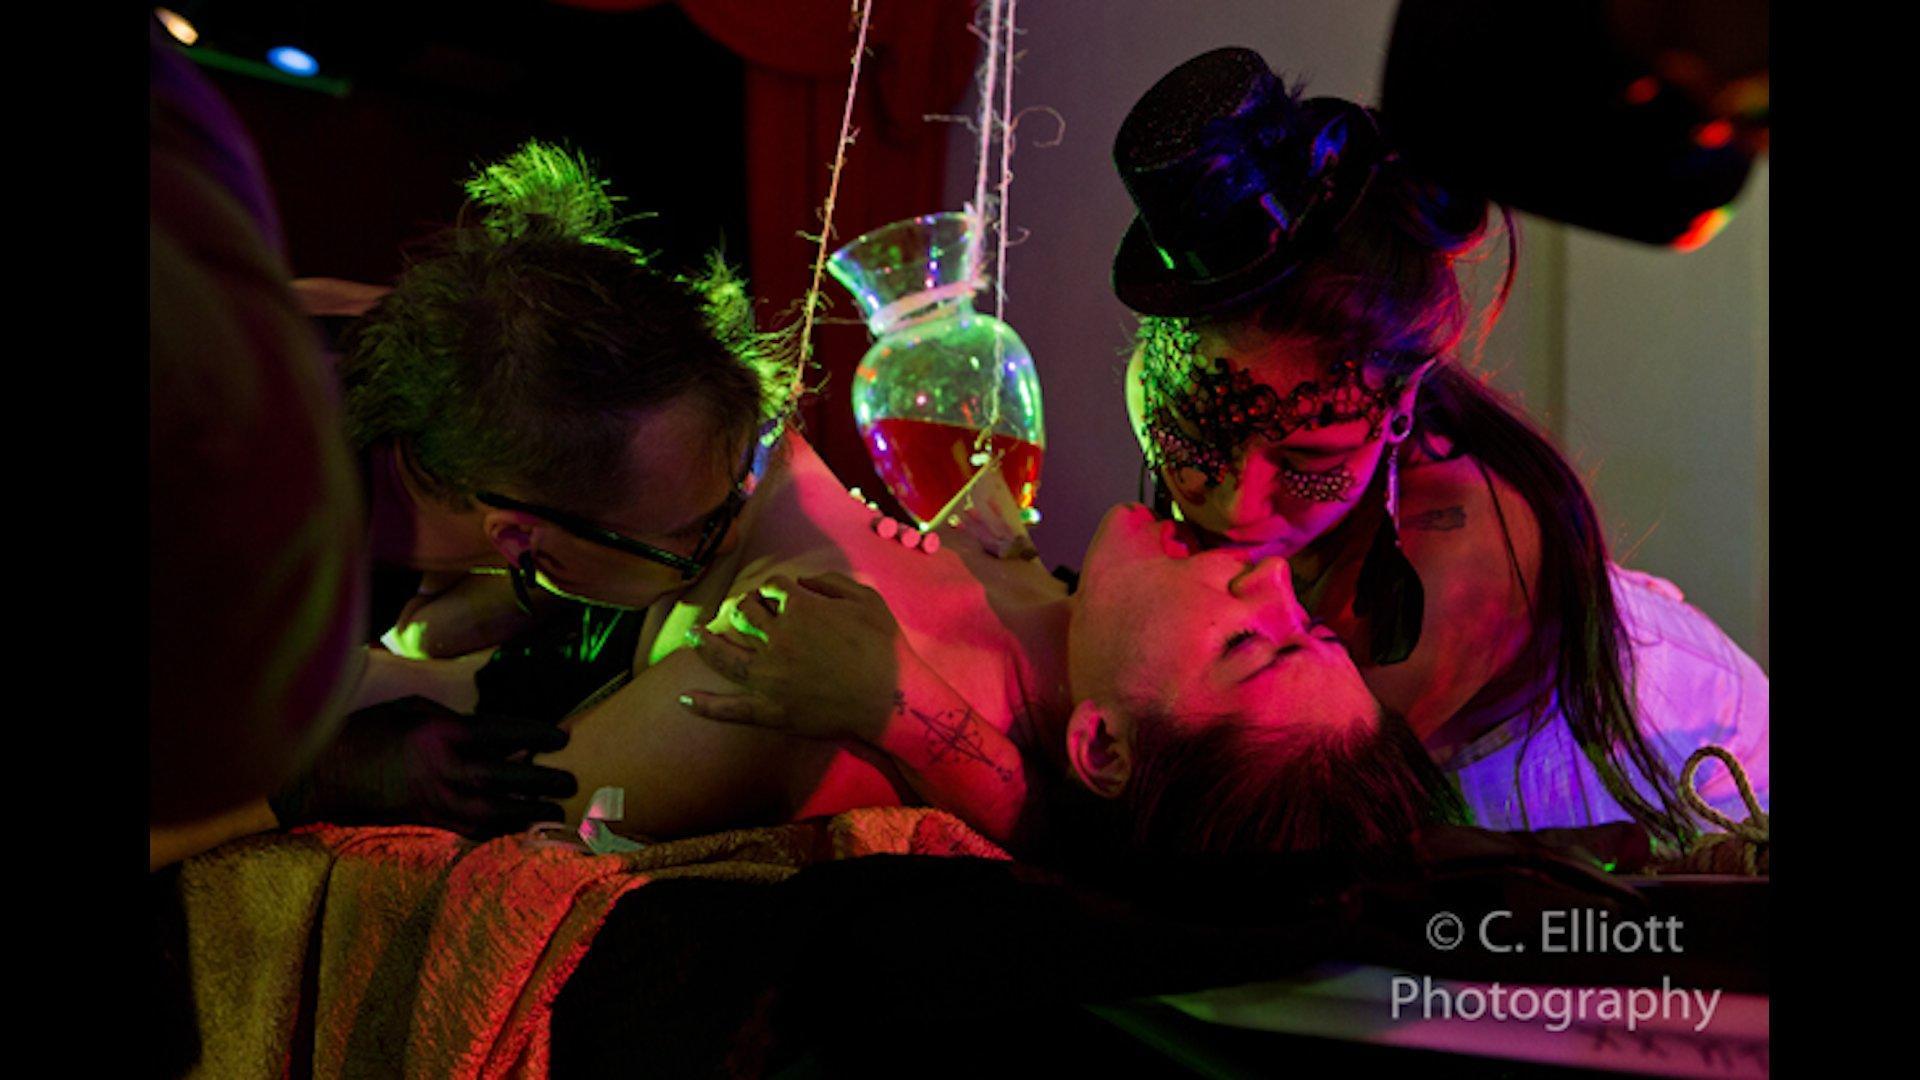 Photo number 5 from FEED: The Last Supper shot for Bleu Films on Kink.com. Featuring Jessie Sparkles, Big Papa, Megan Amber, Ruf Rollin, Clown Girl, Drillian, Juan Nightstand, Work Boxx, M. Jackalinski, Natalie, Gasper Johnson, Espirro de Gata, Cortessa Von Ness, Coin Boy, Nina OG, Marla Mae, Smith Vivienne, Ellarey and Nico in hardcore BDSM & Fetish porn.